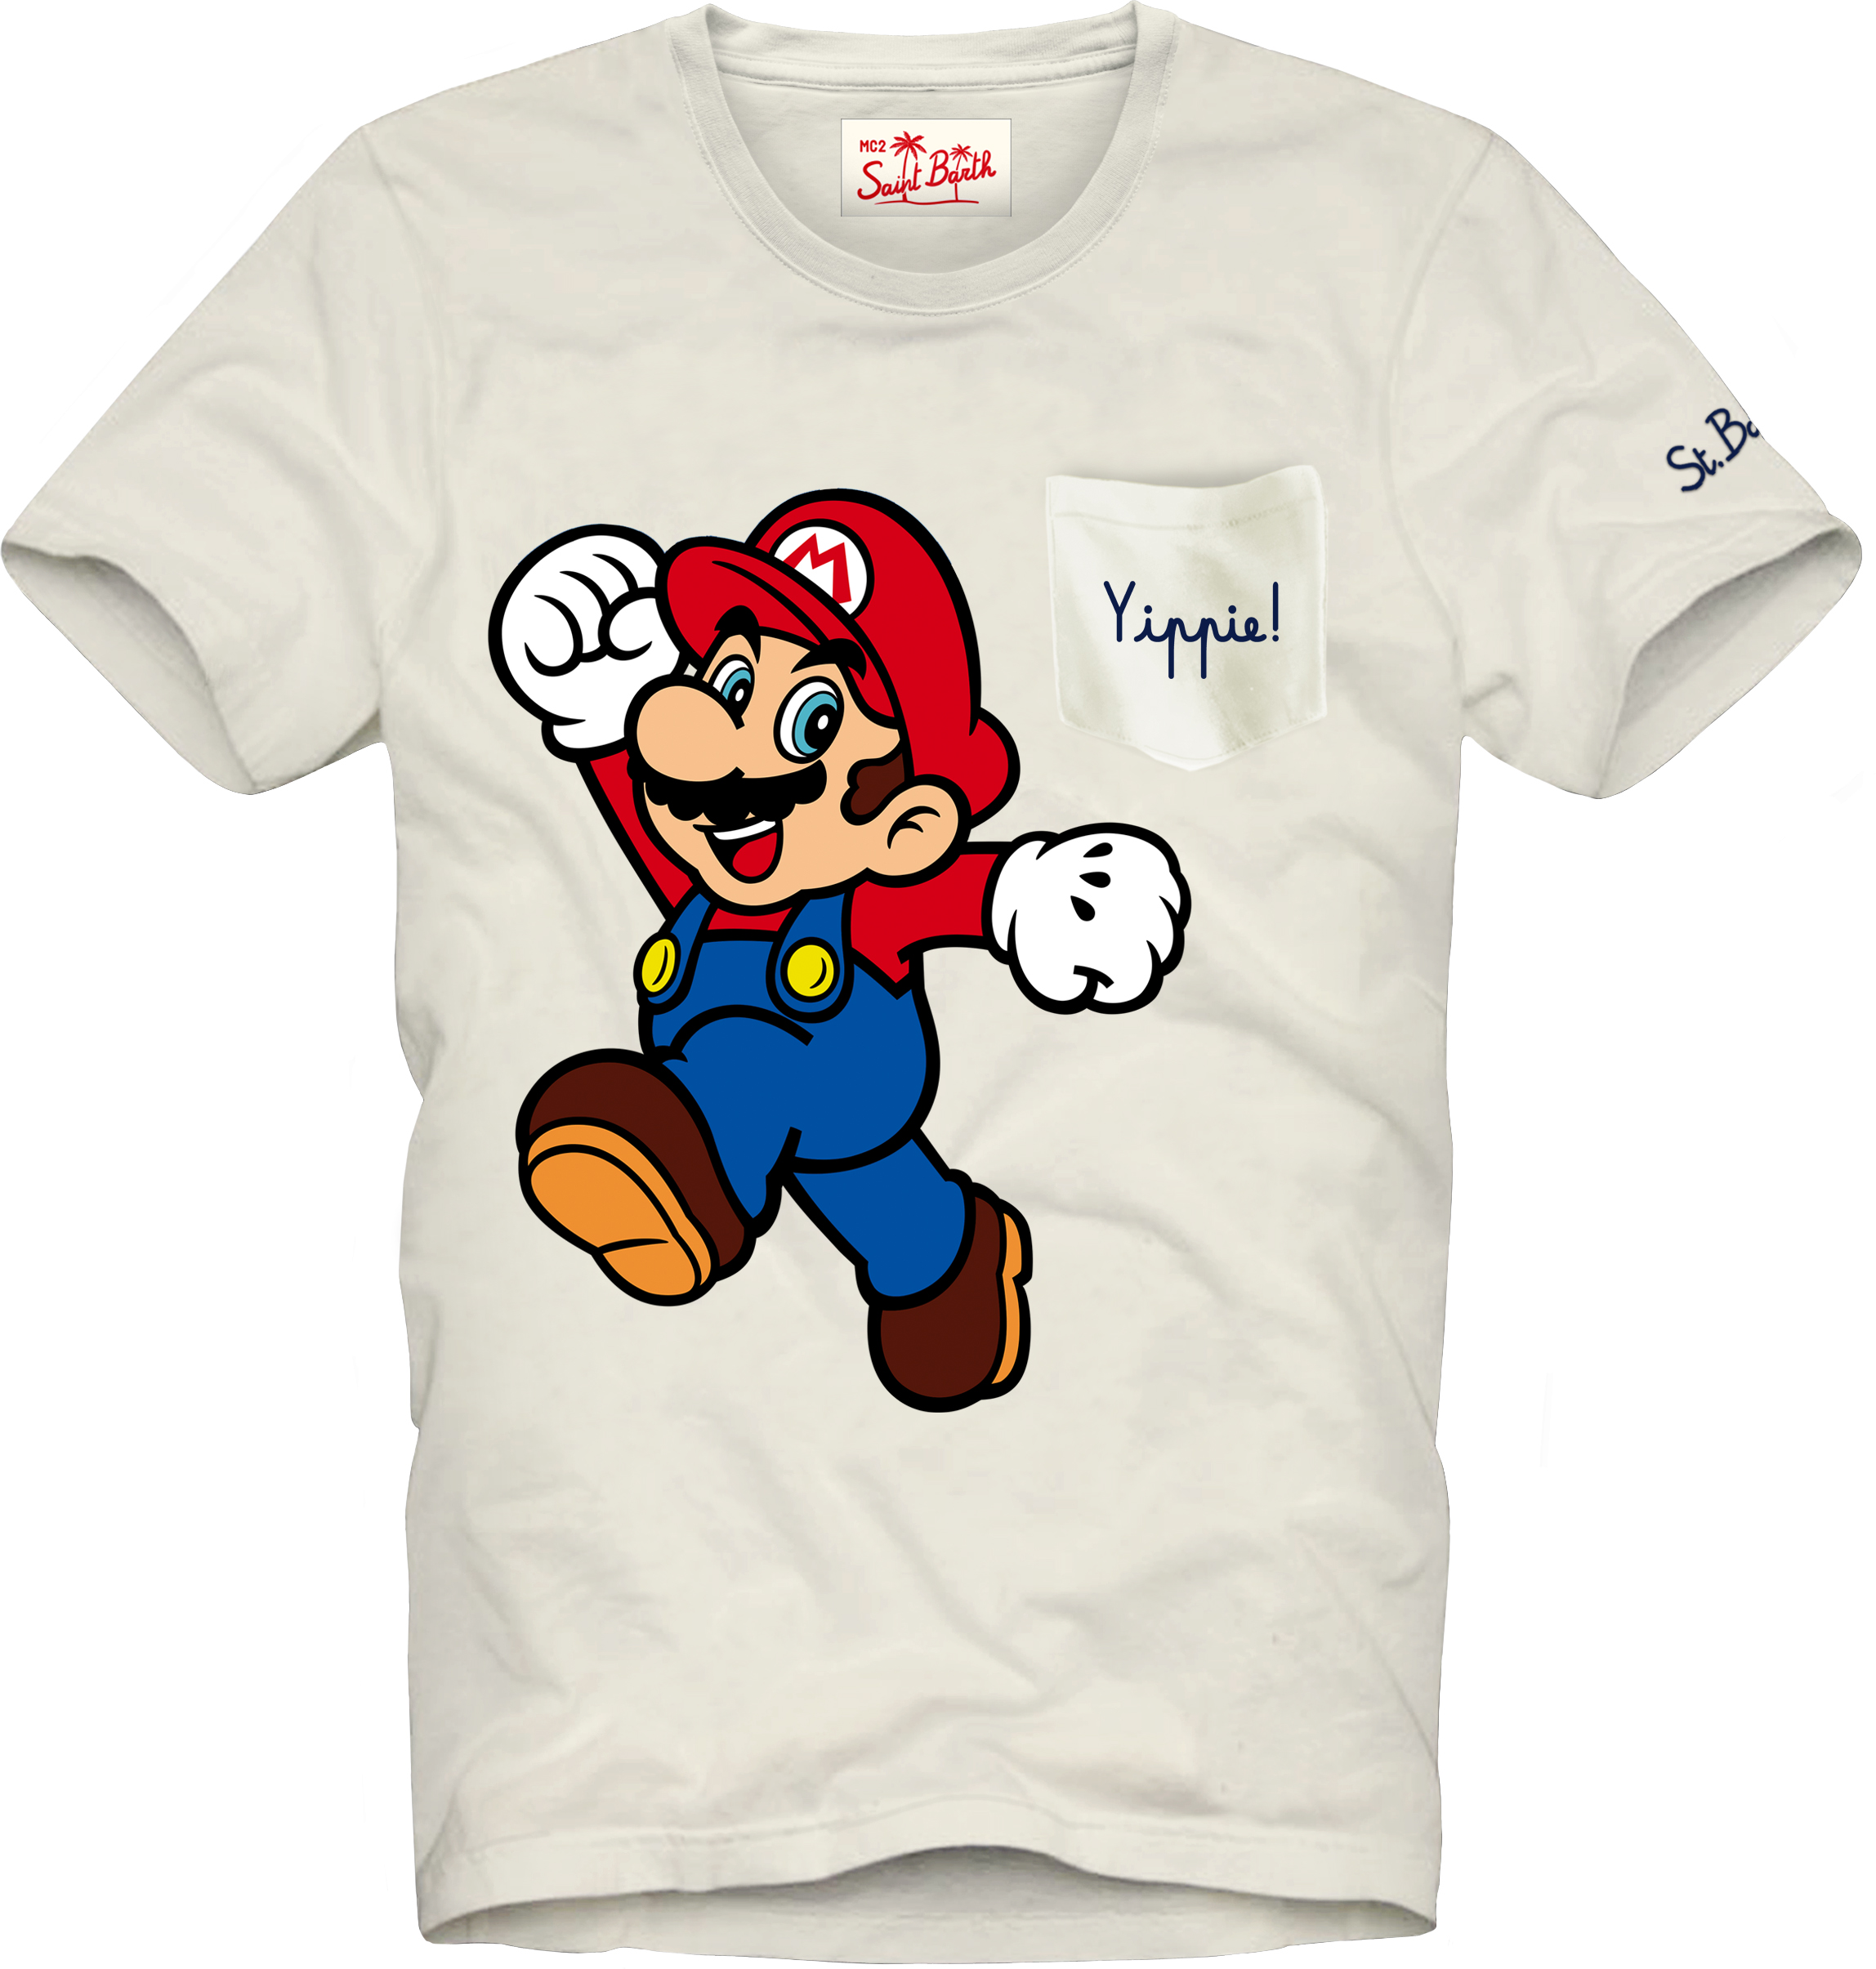 MC2  SAINT BARTH   T-shirts   AUS0001EMLA11